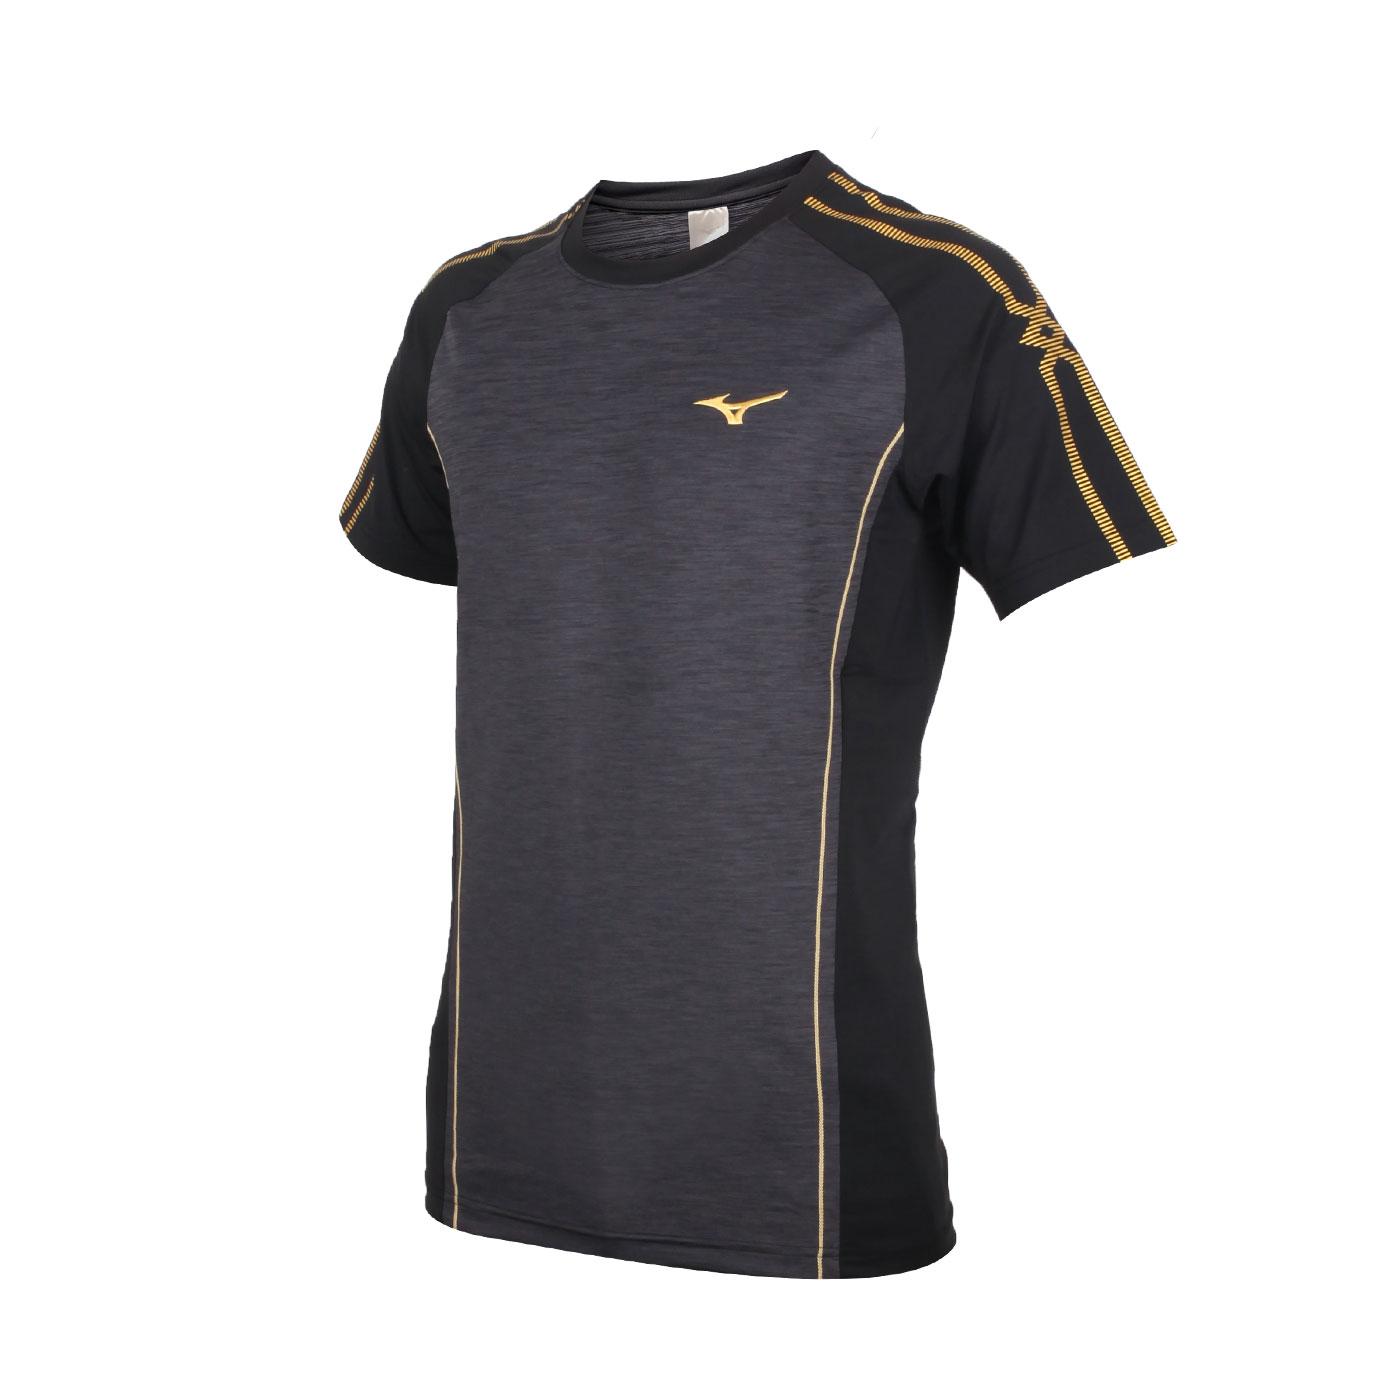 MIZUNO 男款排球短袖T恤 V2TA0G1999 - 深灰黑金